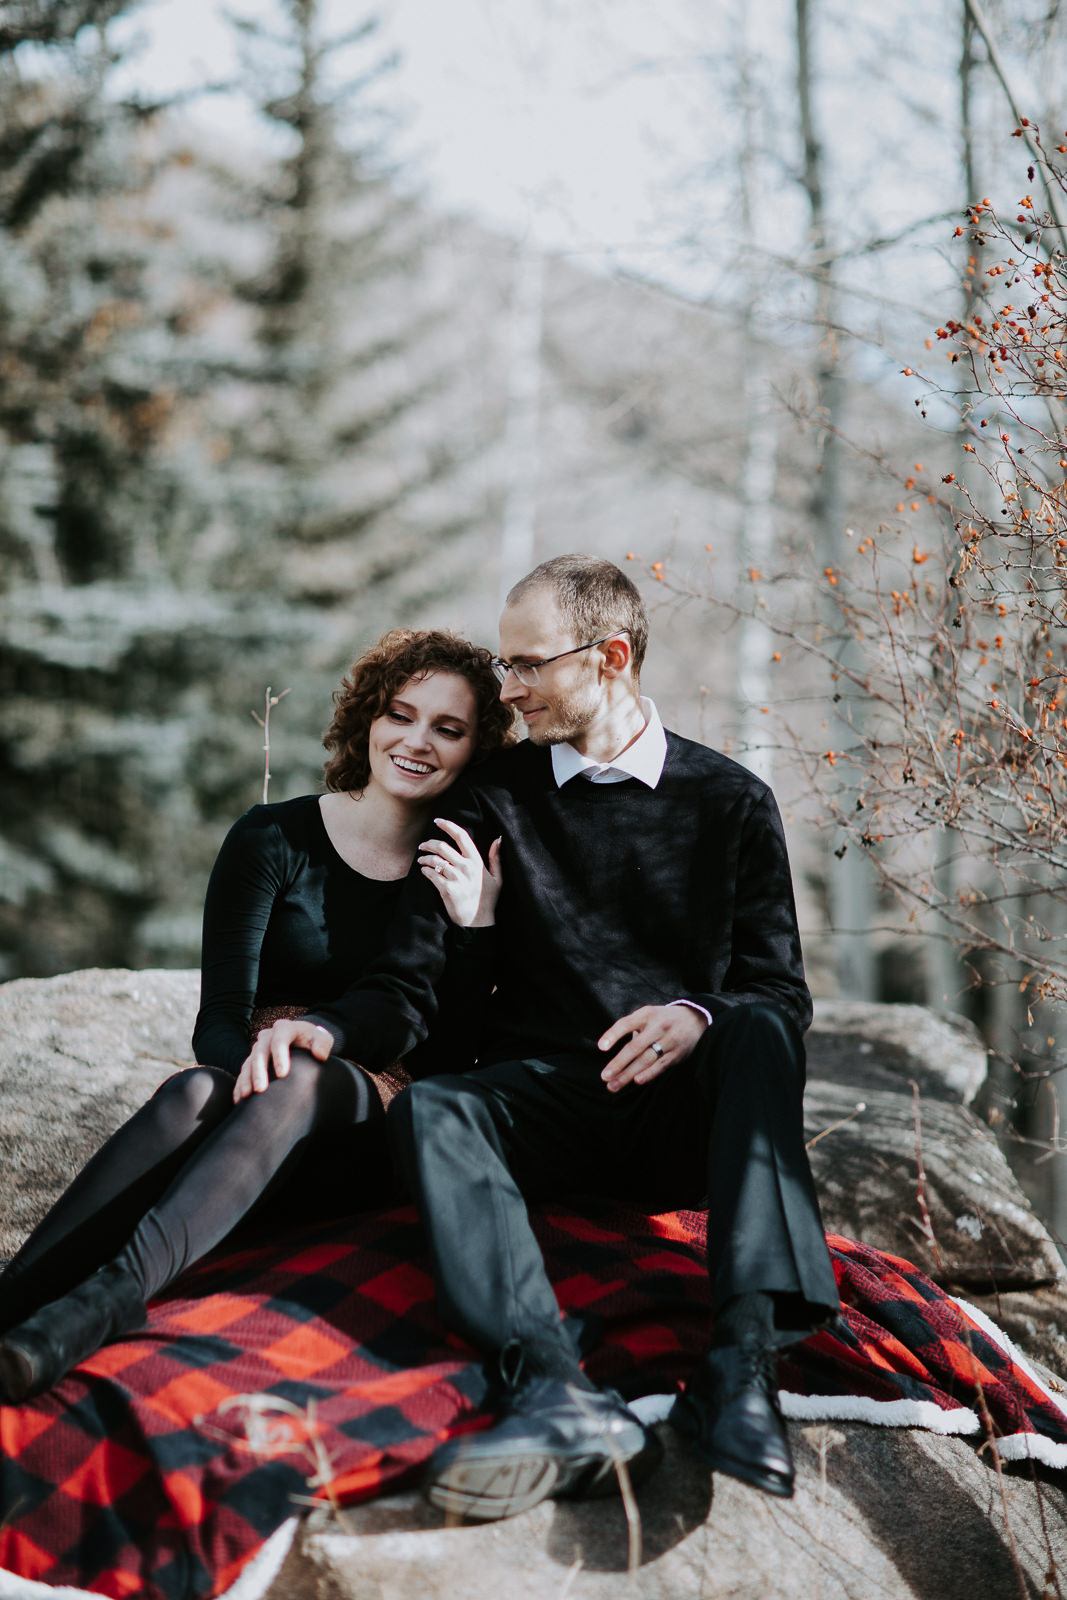 Vail Colorado Engagement Aspen Trees Blanket